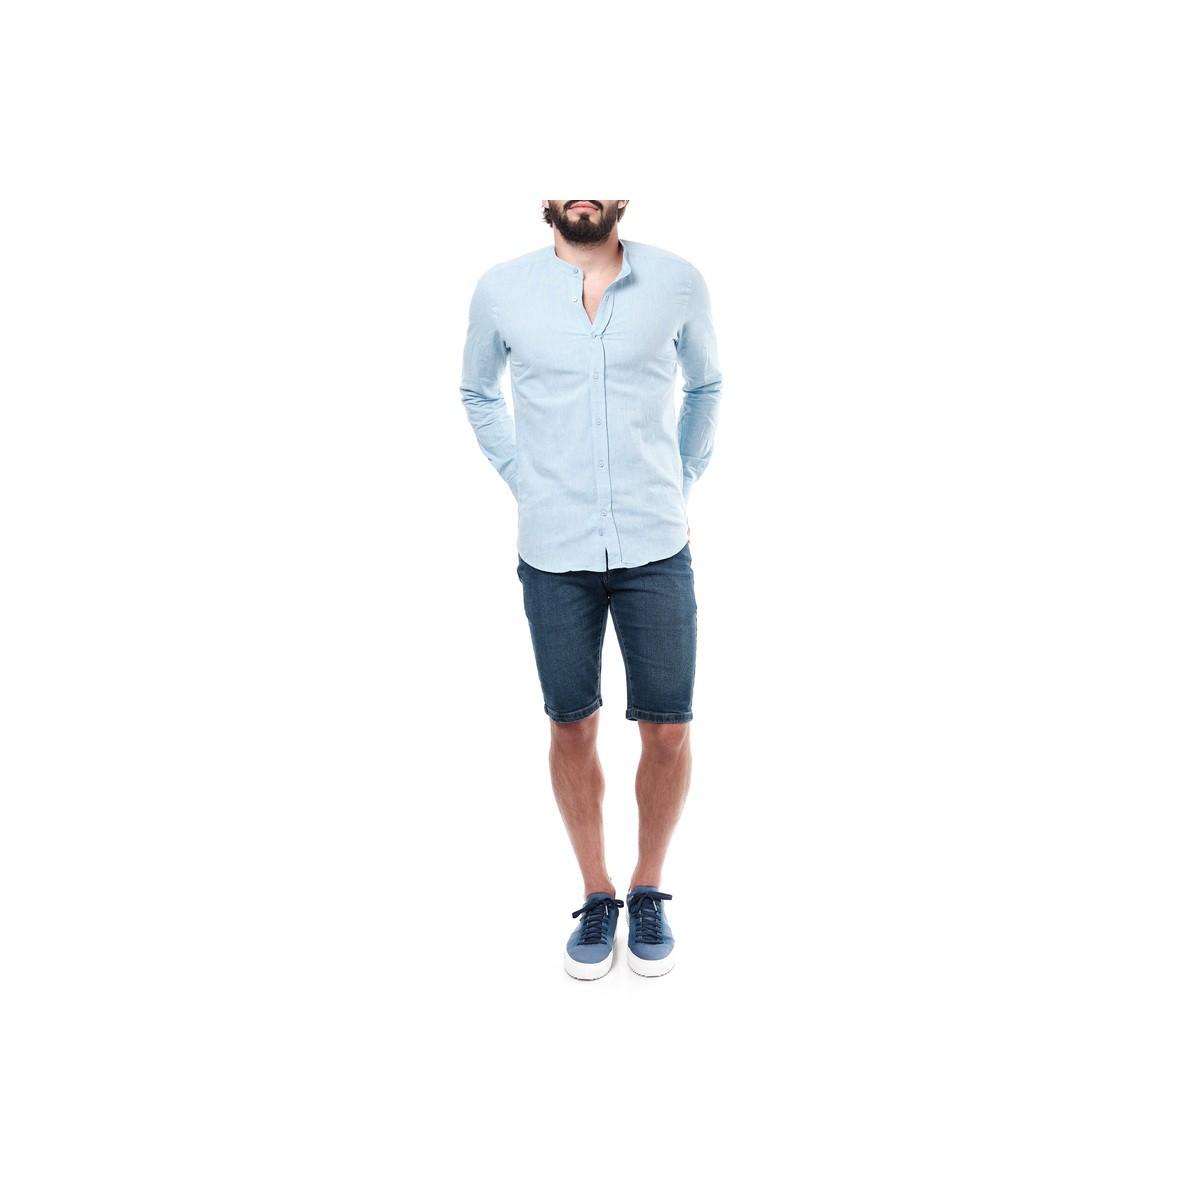 T-shirt Acnologia